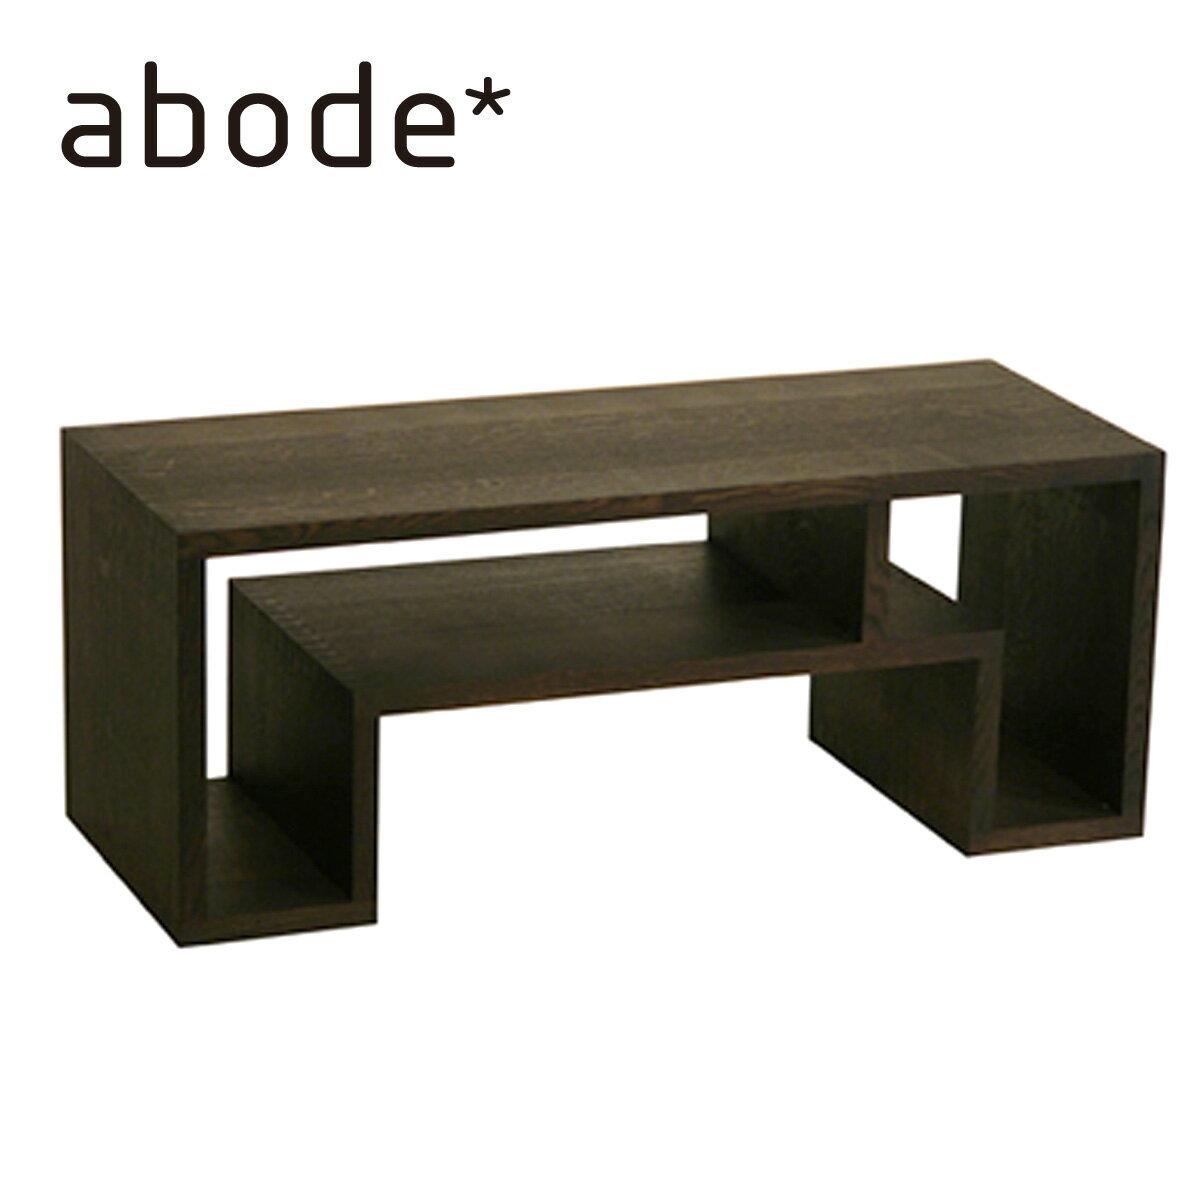 abode オケージョナルテーブル スモールサイズ ダークブラウン Occasional Tablel Small / ウー・バホリヨディン Ou Baholyodhin バホリヨデン SHOJIシリーズ 収納棚・テーブル・什器・スツール・マガジンラック・コンソール